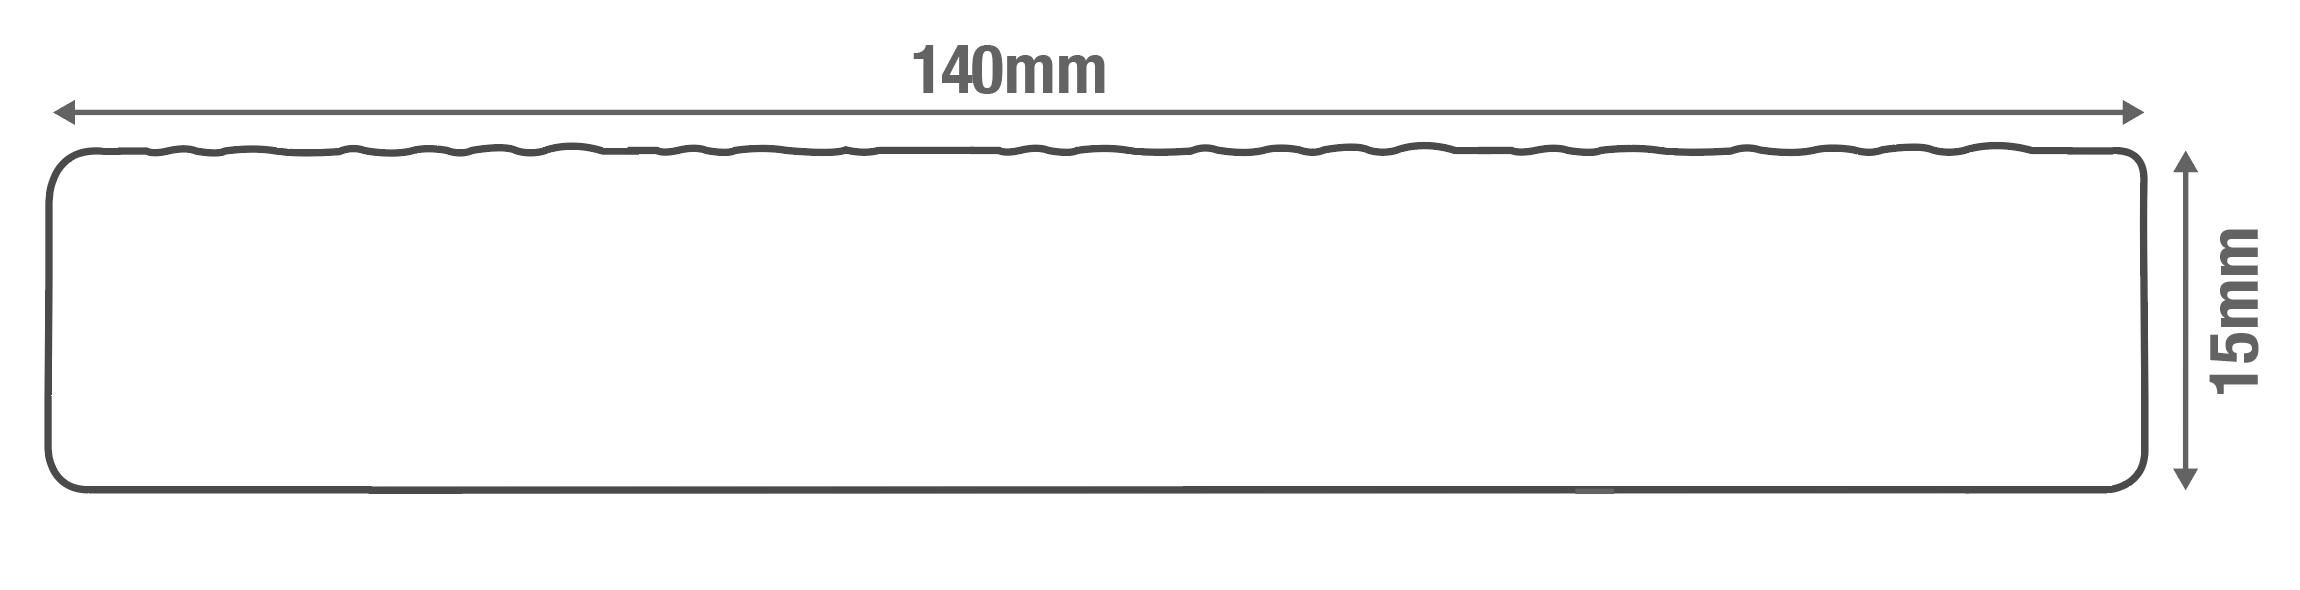 Capstock PVC-ASA Woodgrain Effect Premium Grade Bullnose Fascia Board Diagram